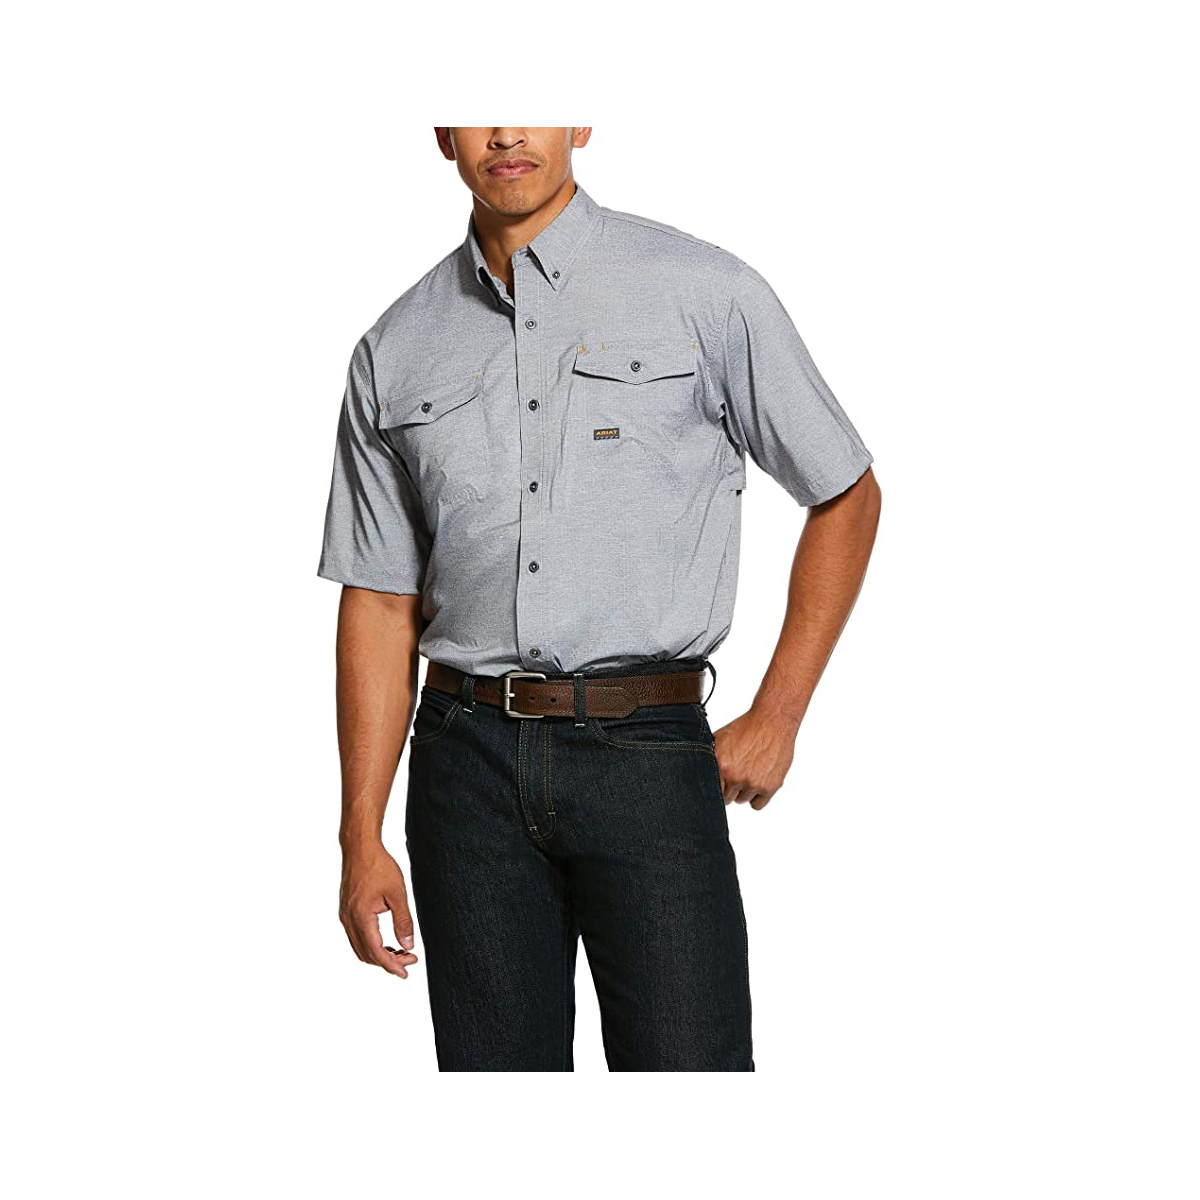 Men's Rebar Made Tough VentTEK Blue Stretch Work Shirt, Charcoal,Smoke,Steel, swatch